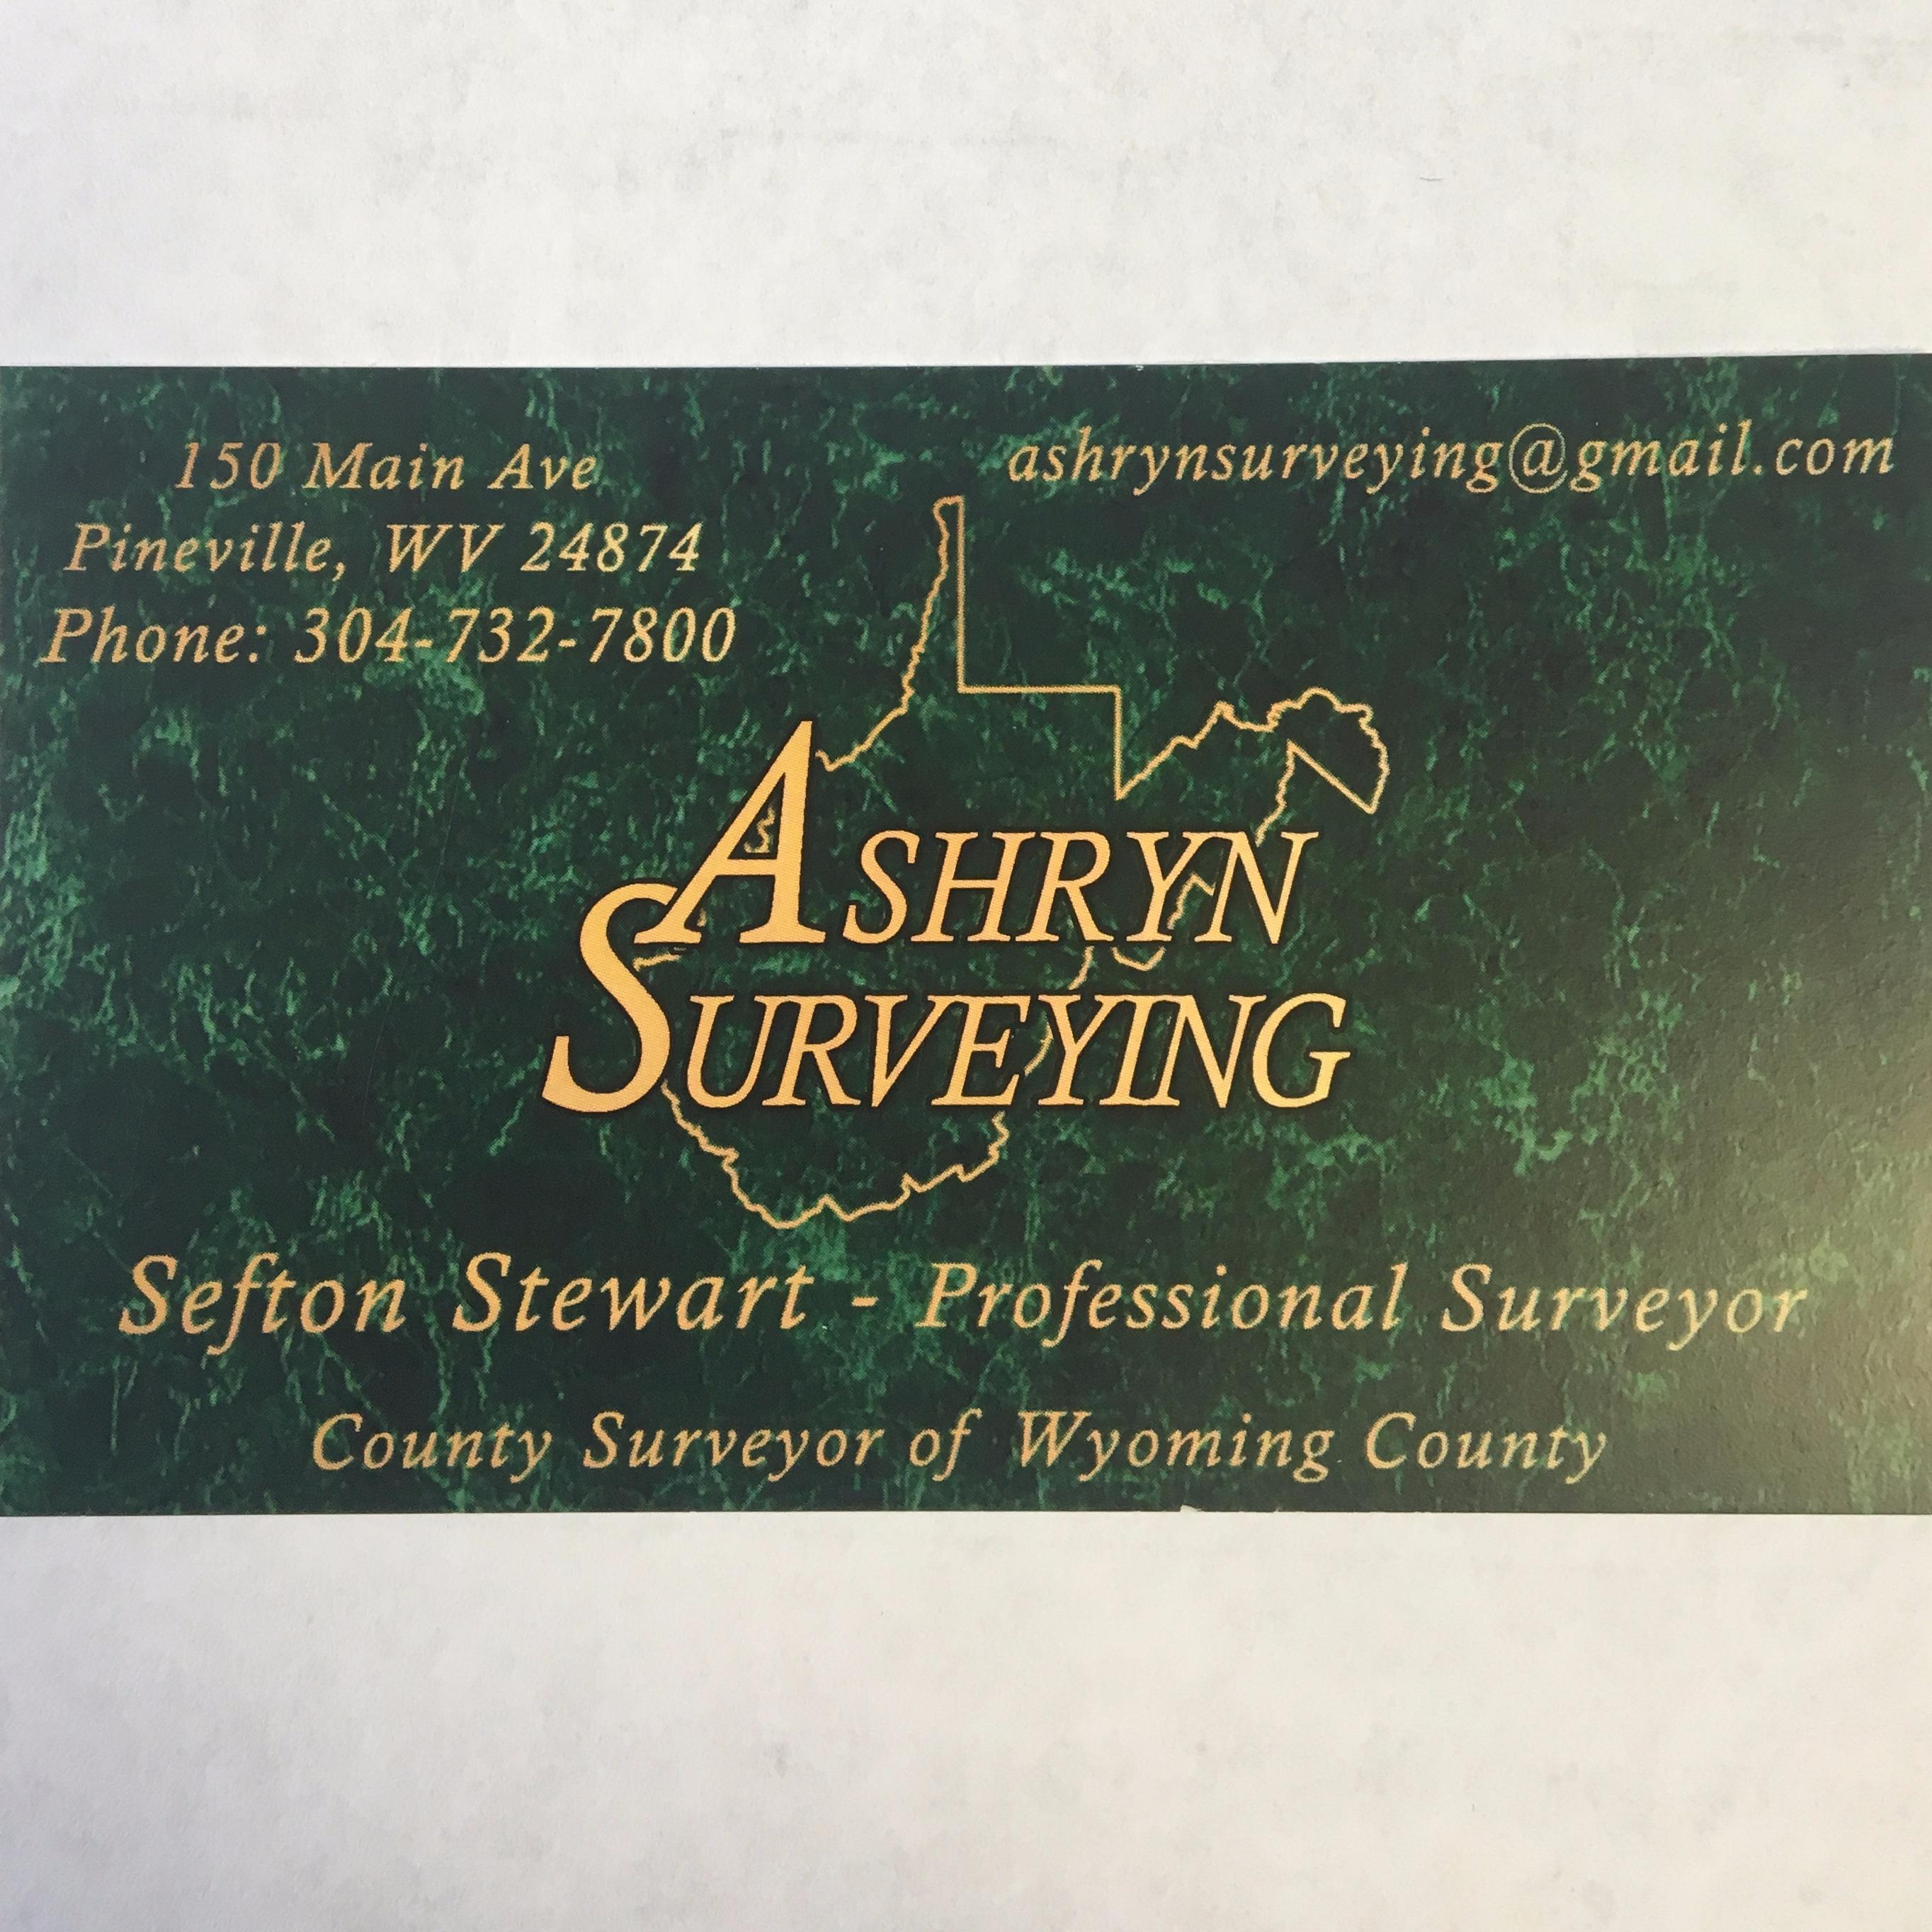 Ashryn Surveying Inc. image 0